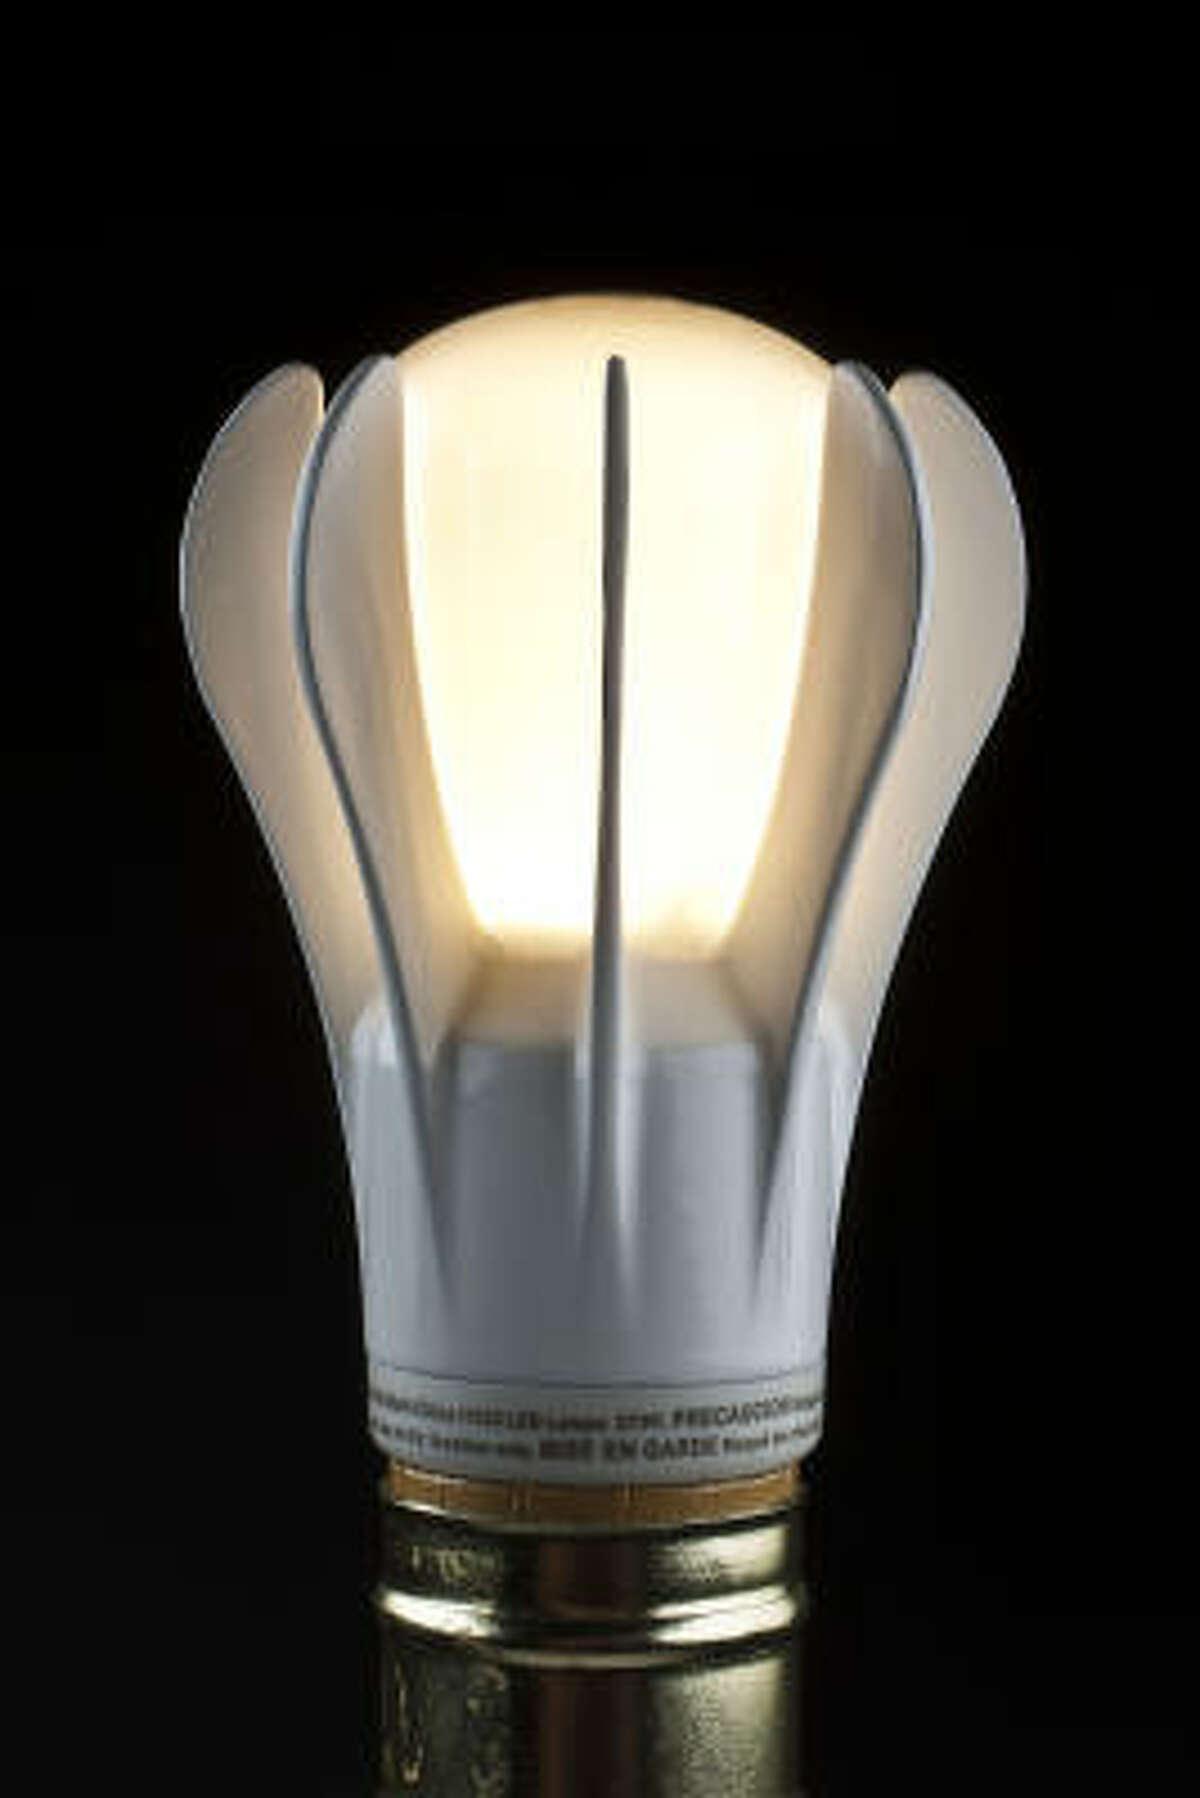 GE Soft White A19 LED 9 watts; 450 lumens Light quality: Warm yellow Brightness: Medium $50 for one